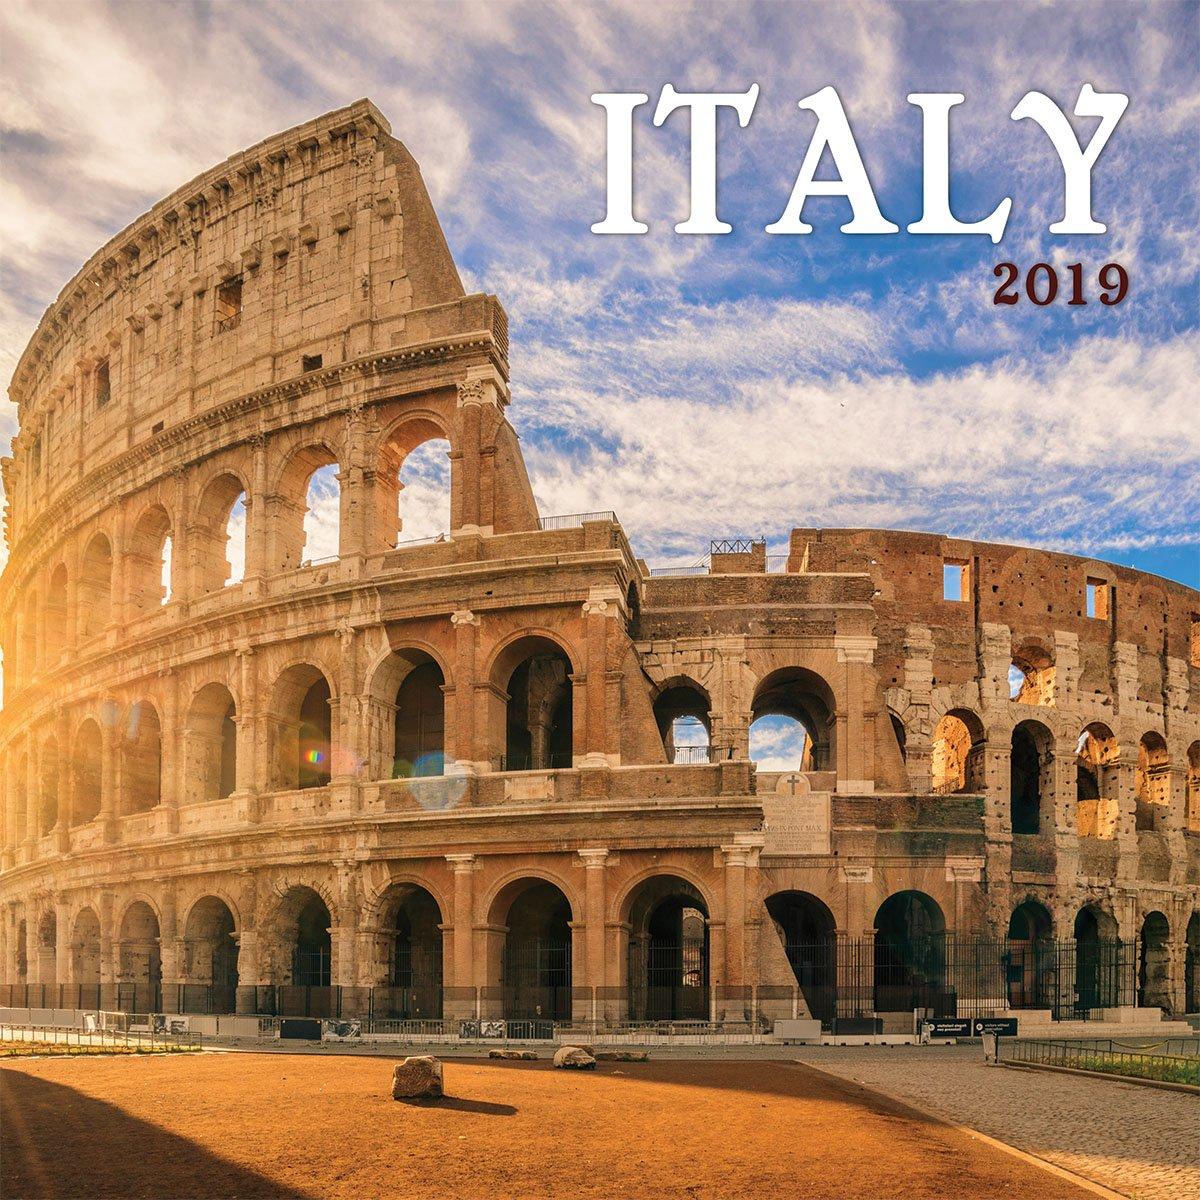 Turner Photo Italy 2019 Wall Calendar (199989400320 Office Wall Calendar (19998940032)